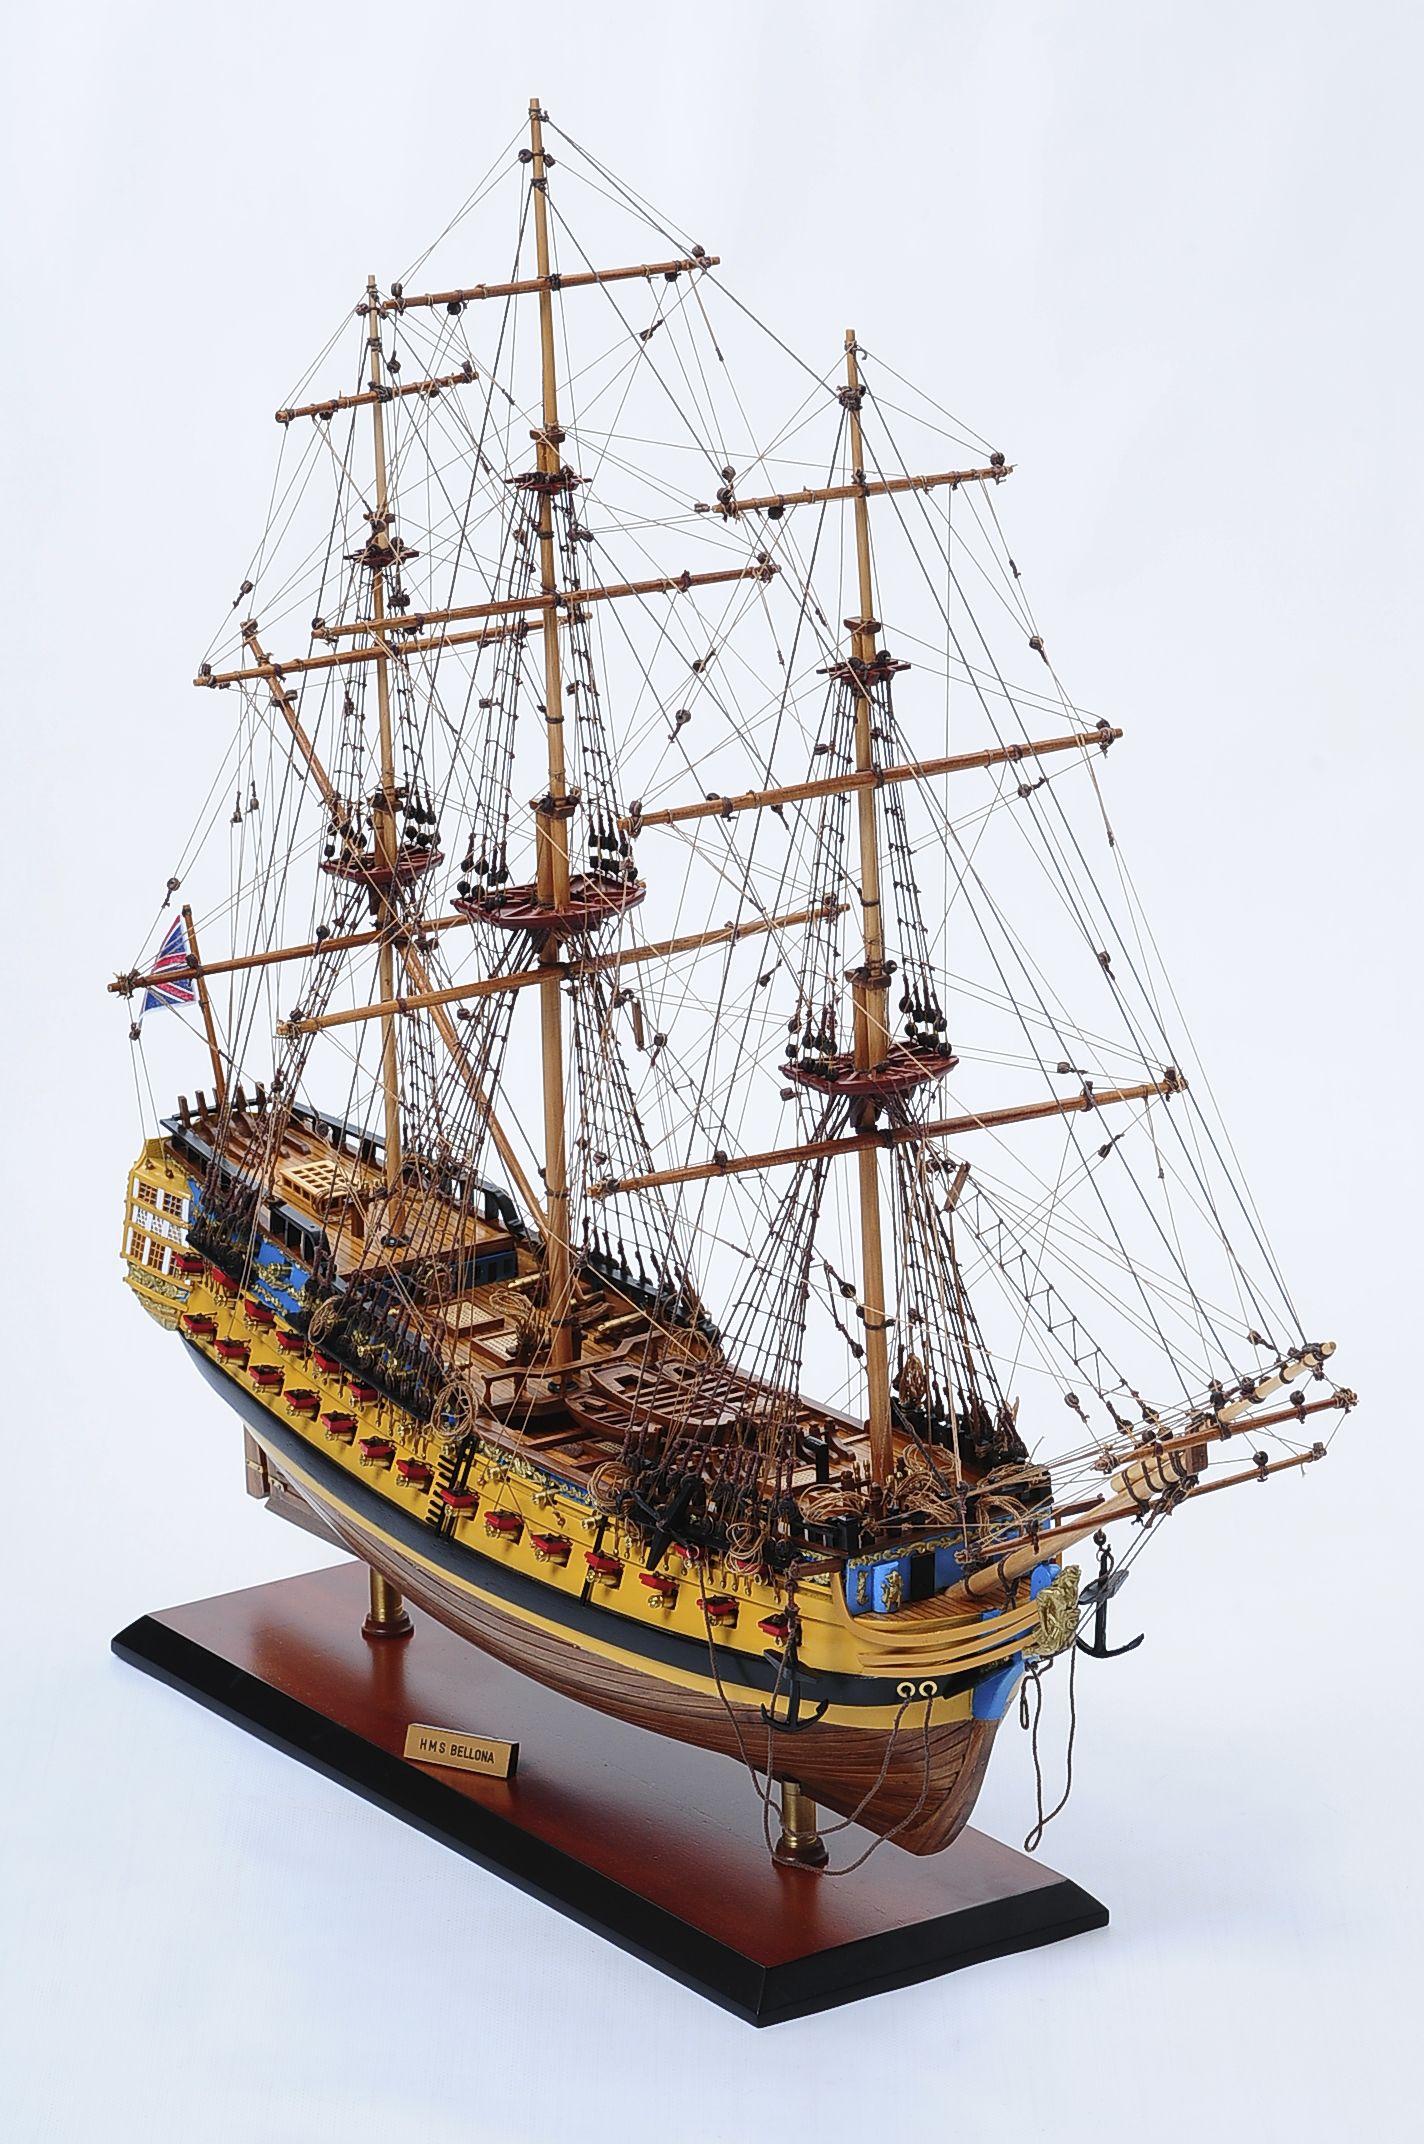 516-6139-HMS-Bellona-Model-Ship-Superior-Range